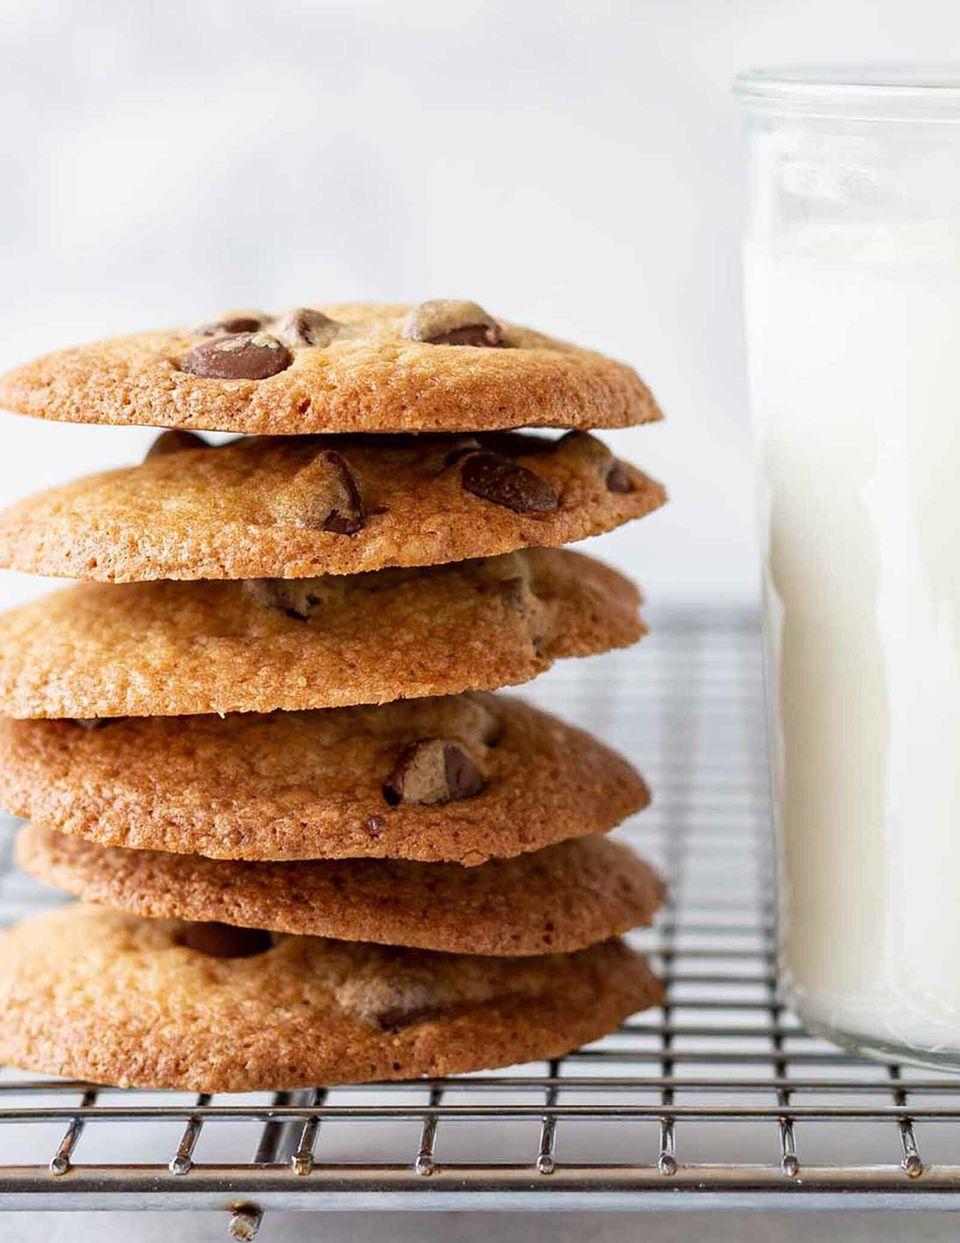 How to Make Crispy Chocolate Chip Cookies